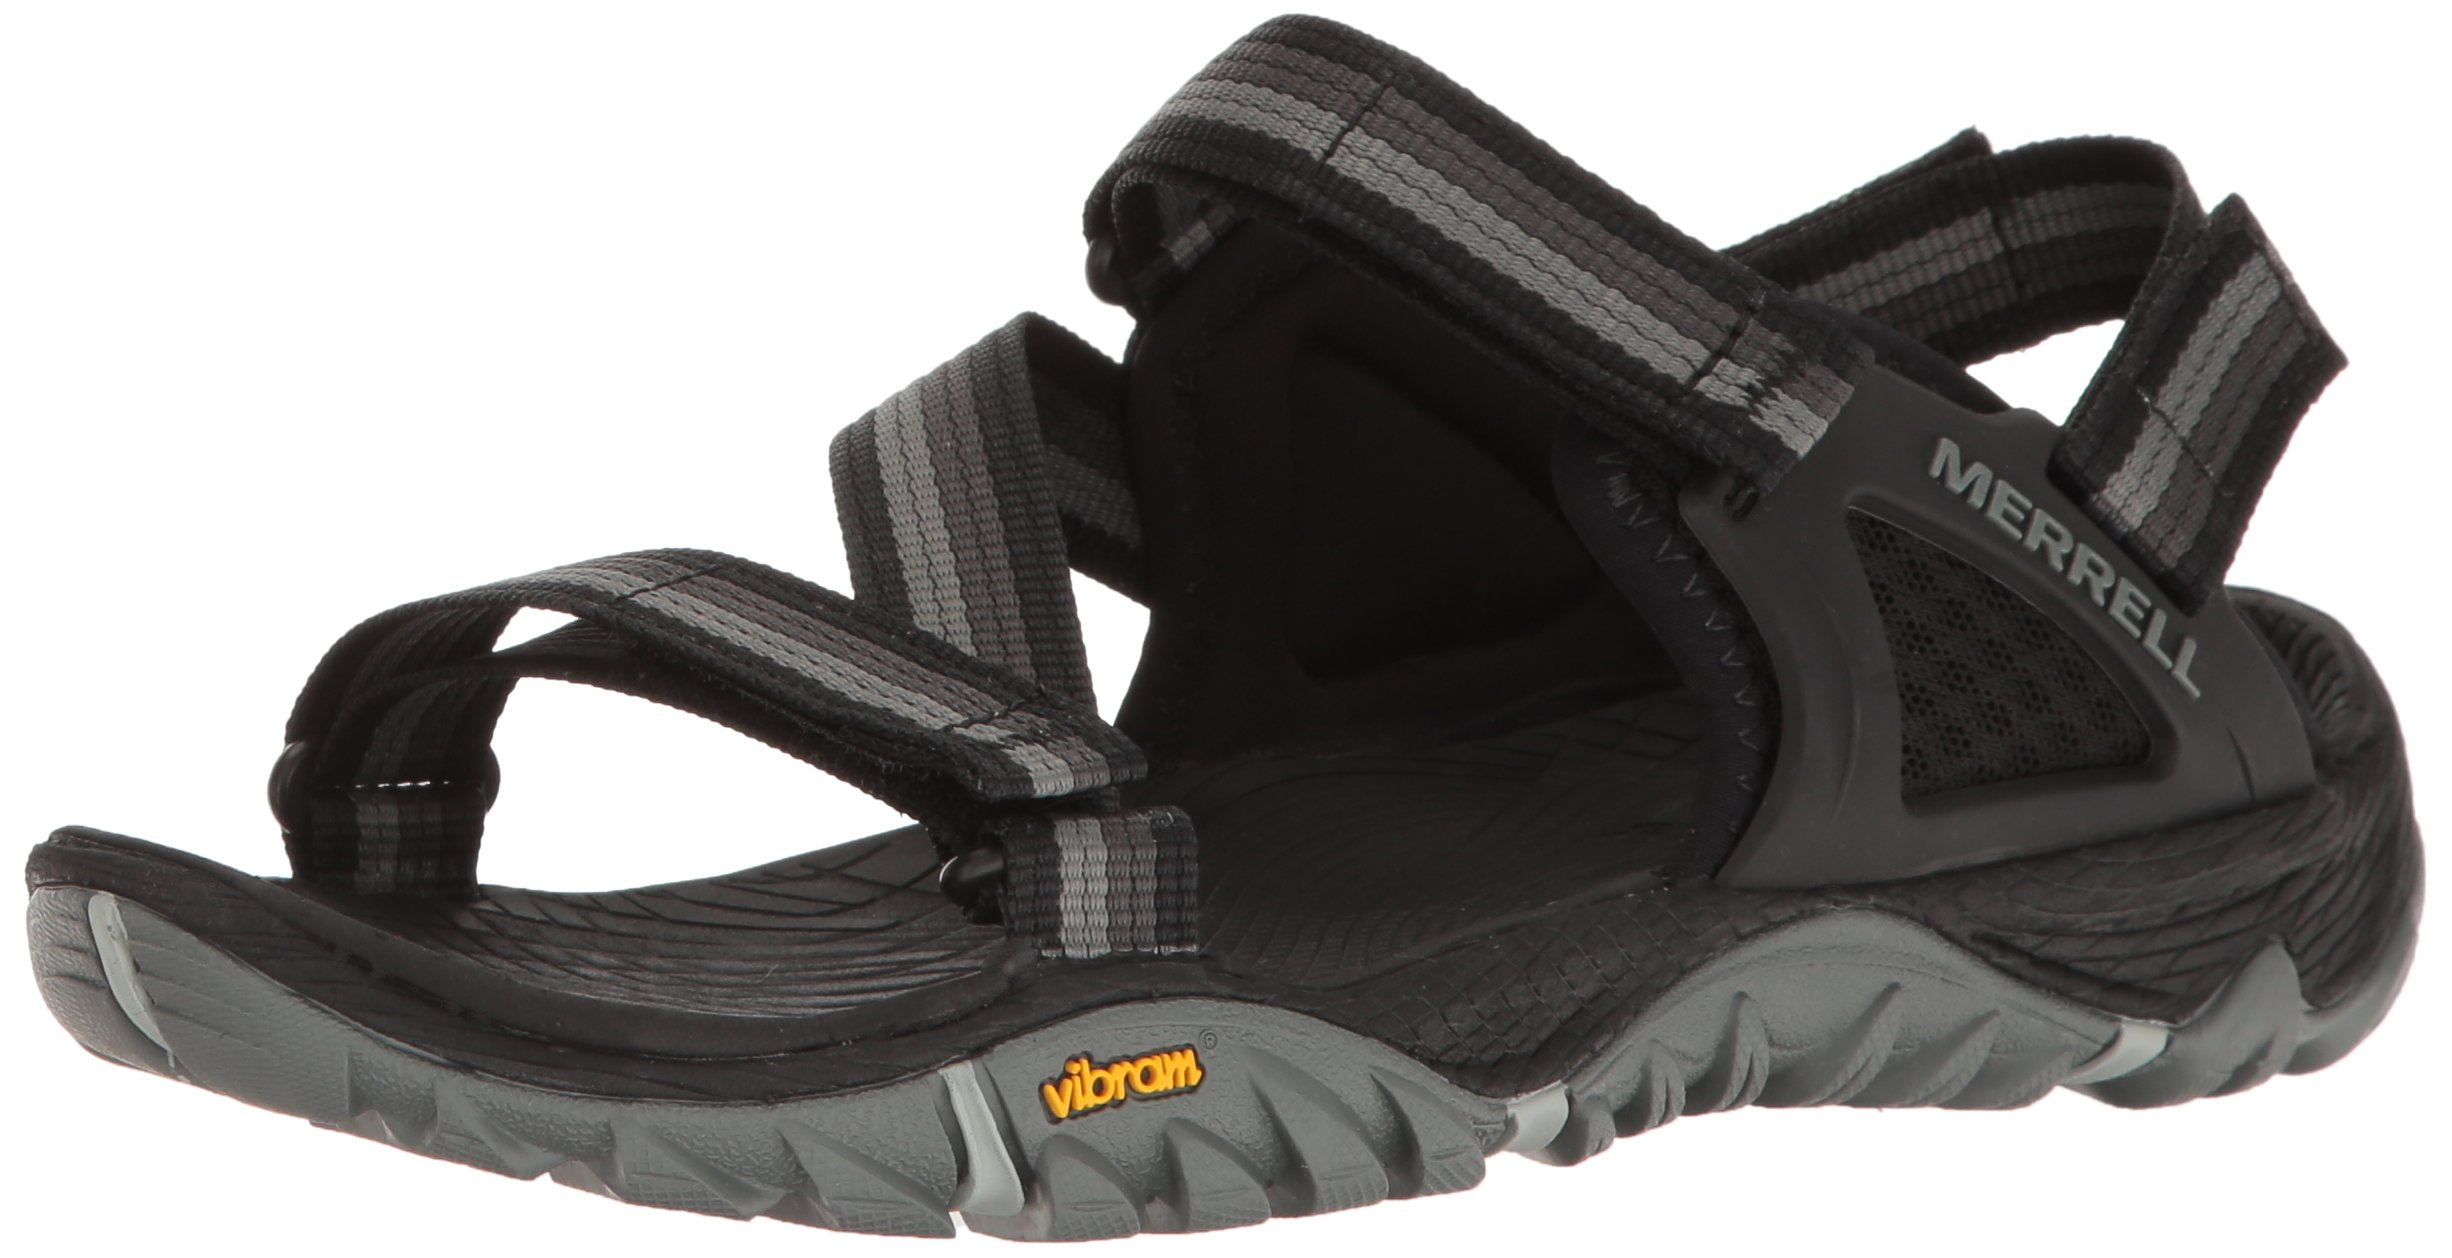 Merrell Women's All Out Blaze Web Sandal, Black, 9 M US